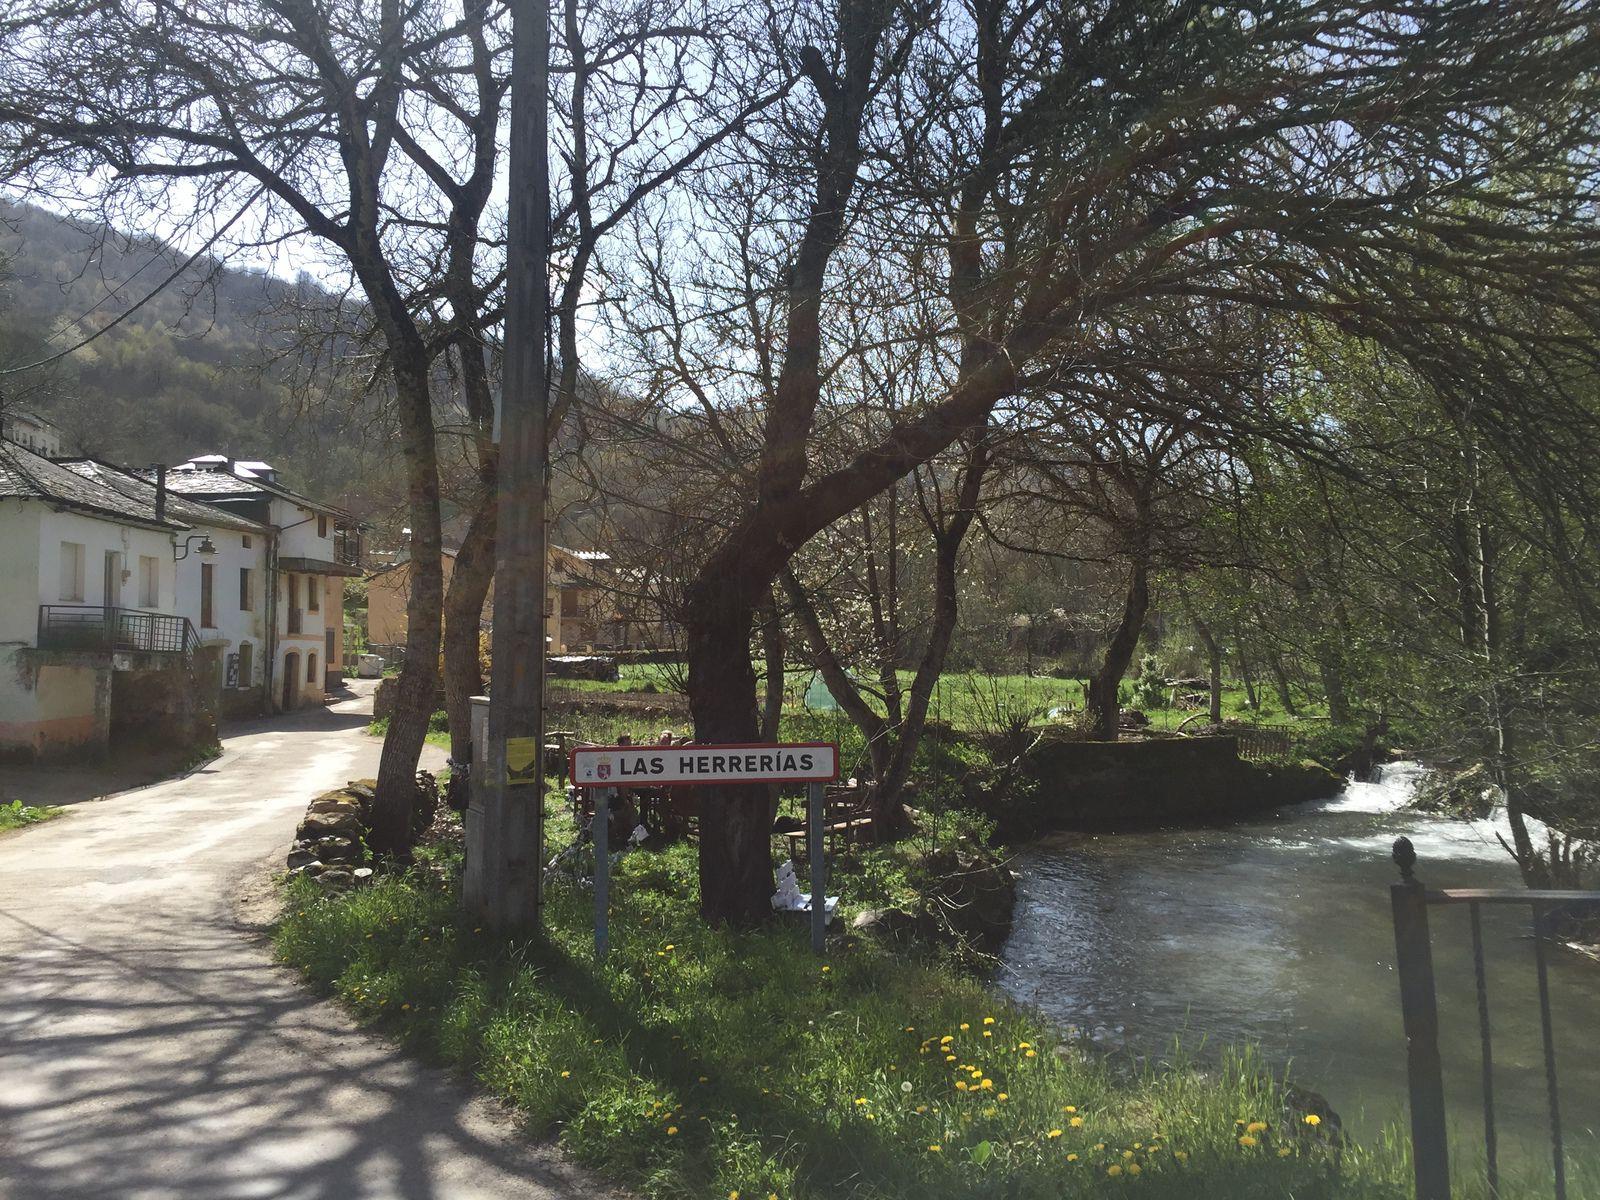 JOUR 21 : CACABELOS - LOS HERRERIAS (30 kms)